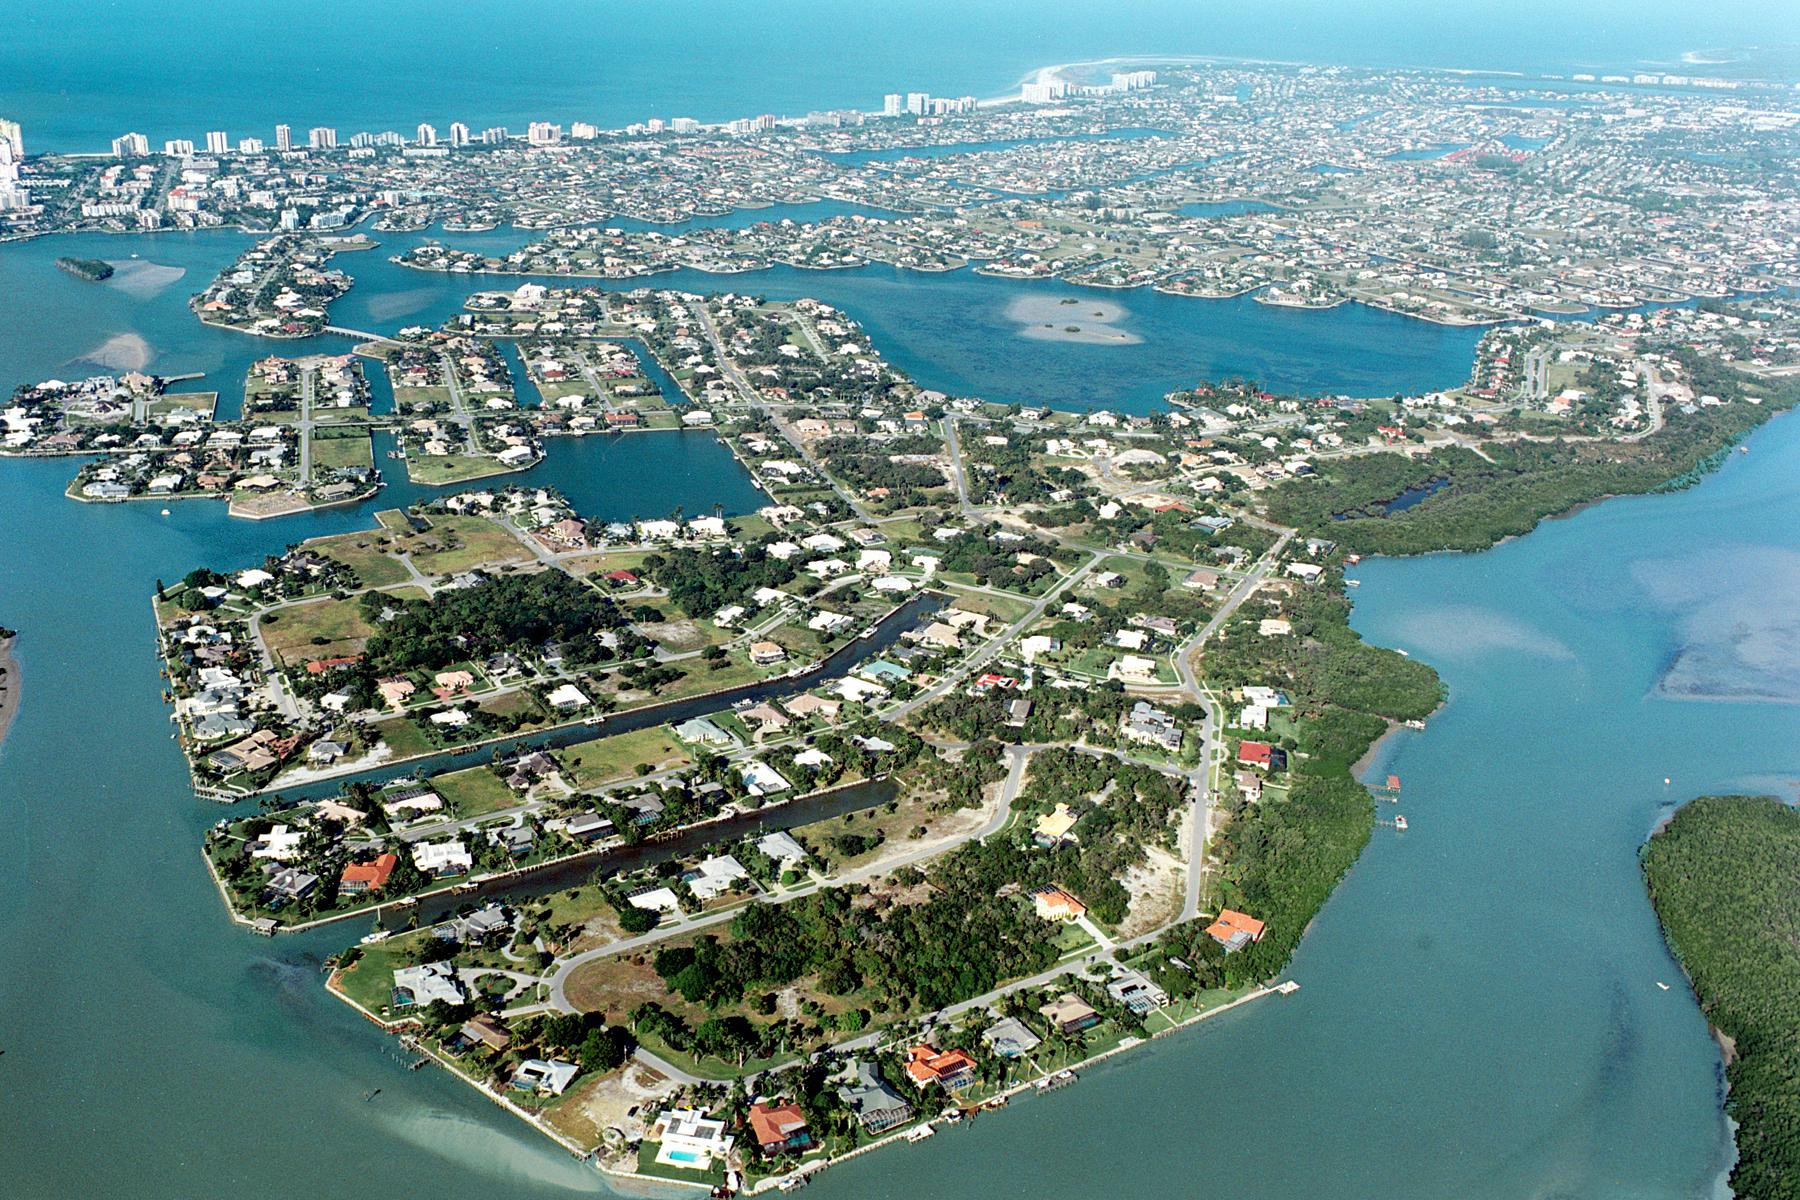 Terreno para Venda às MARCO ISLAND - CAXAMBAS DRIVE 1060 Caxambas Dr Marco Island, Florida, 34145 Estados Unidos